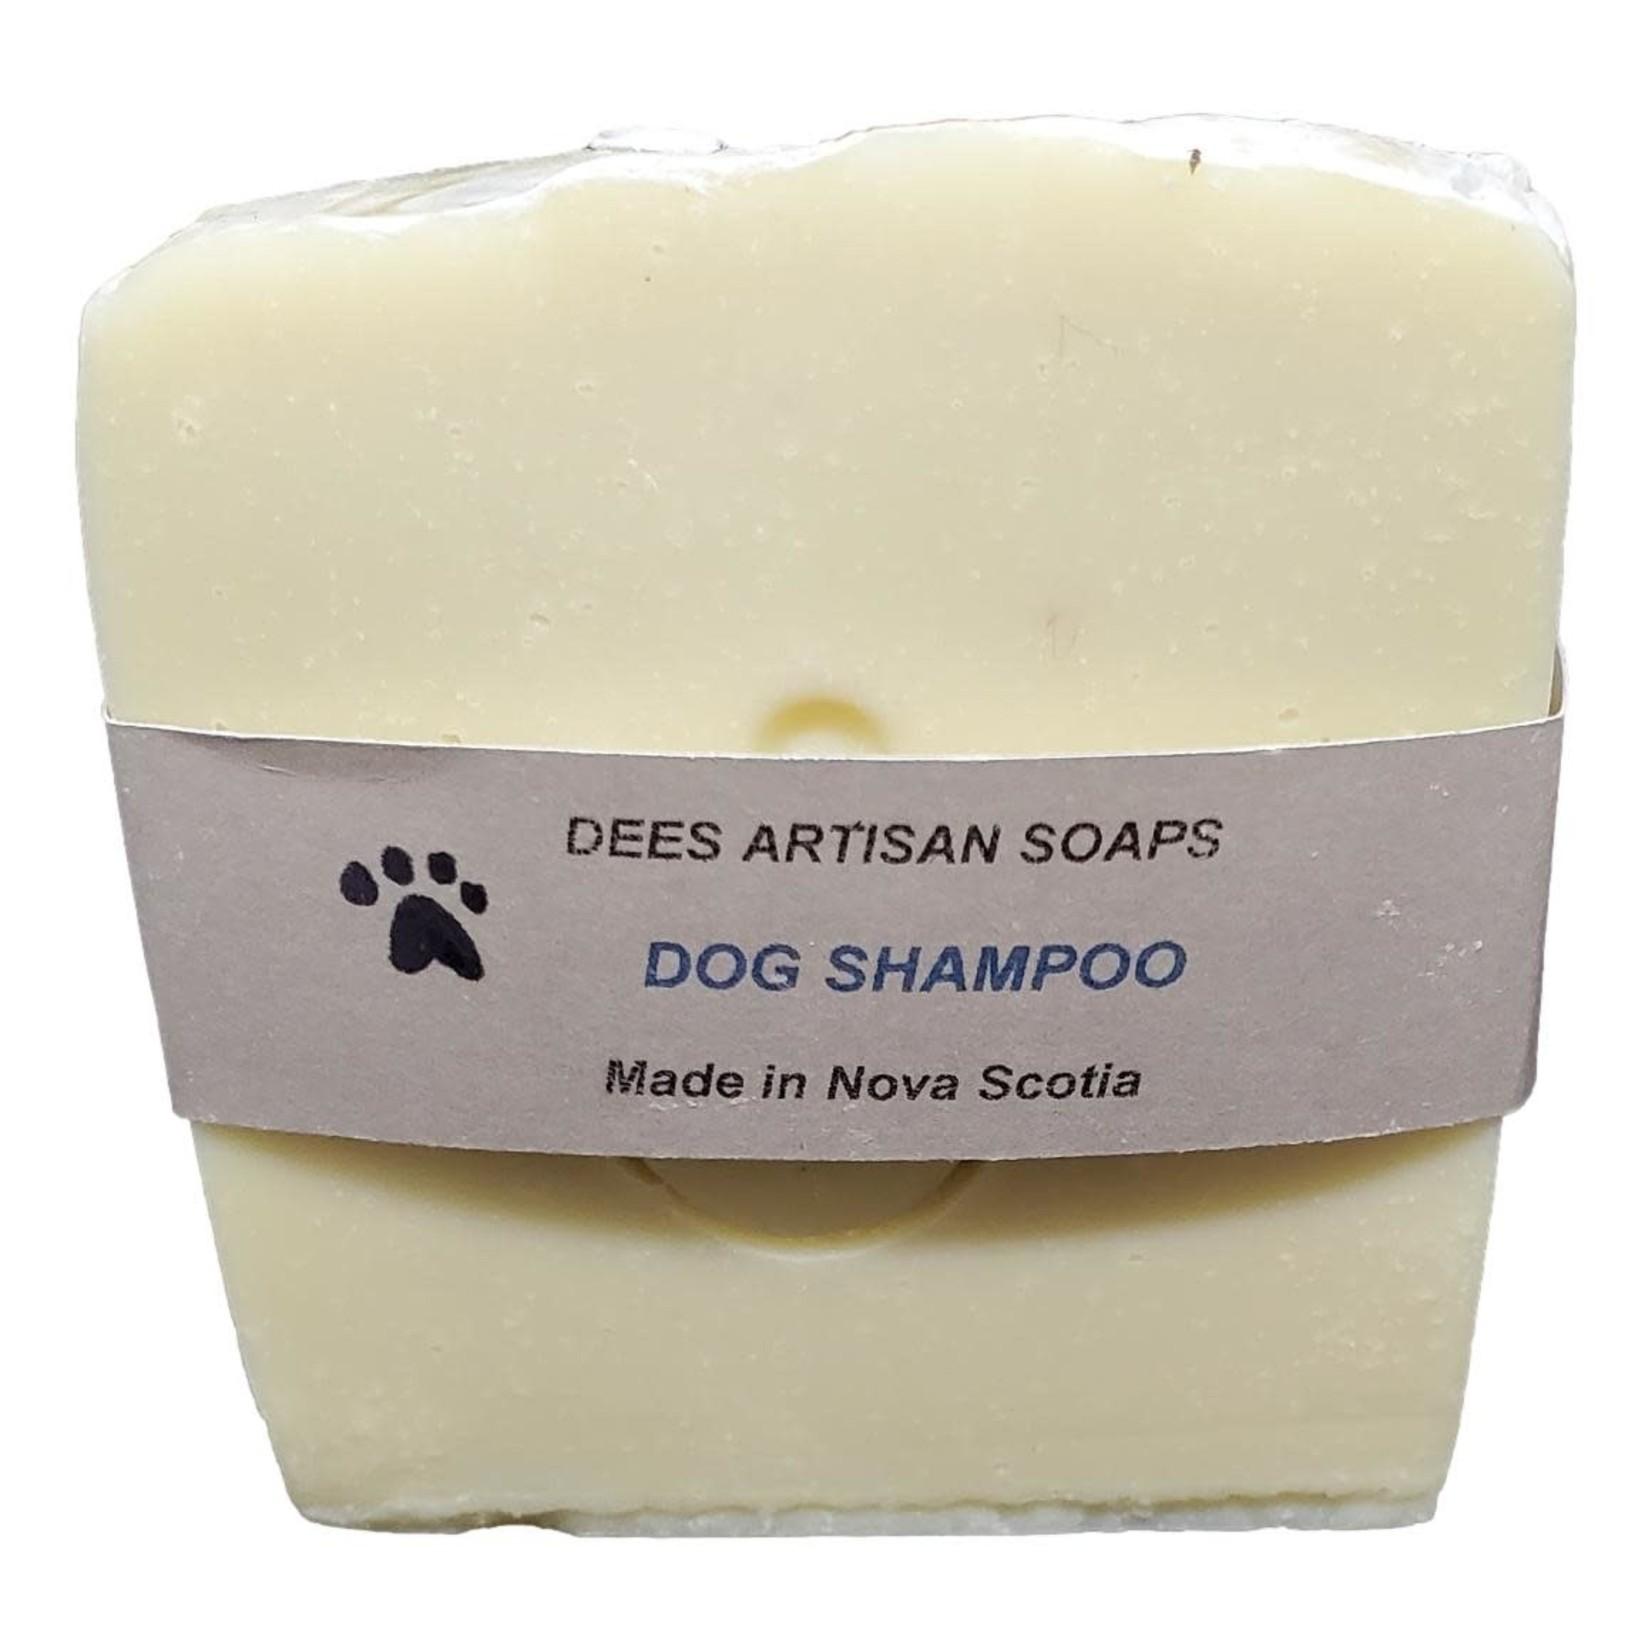 Dee's Artisan Soaps and More Dog Shampoo